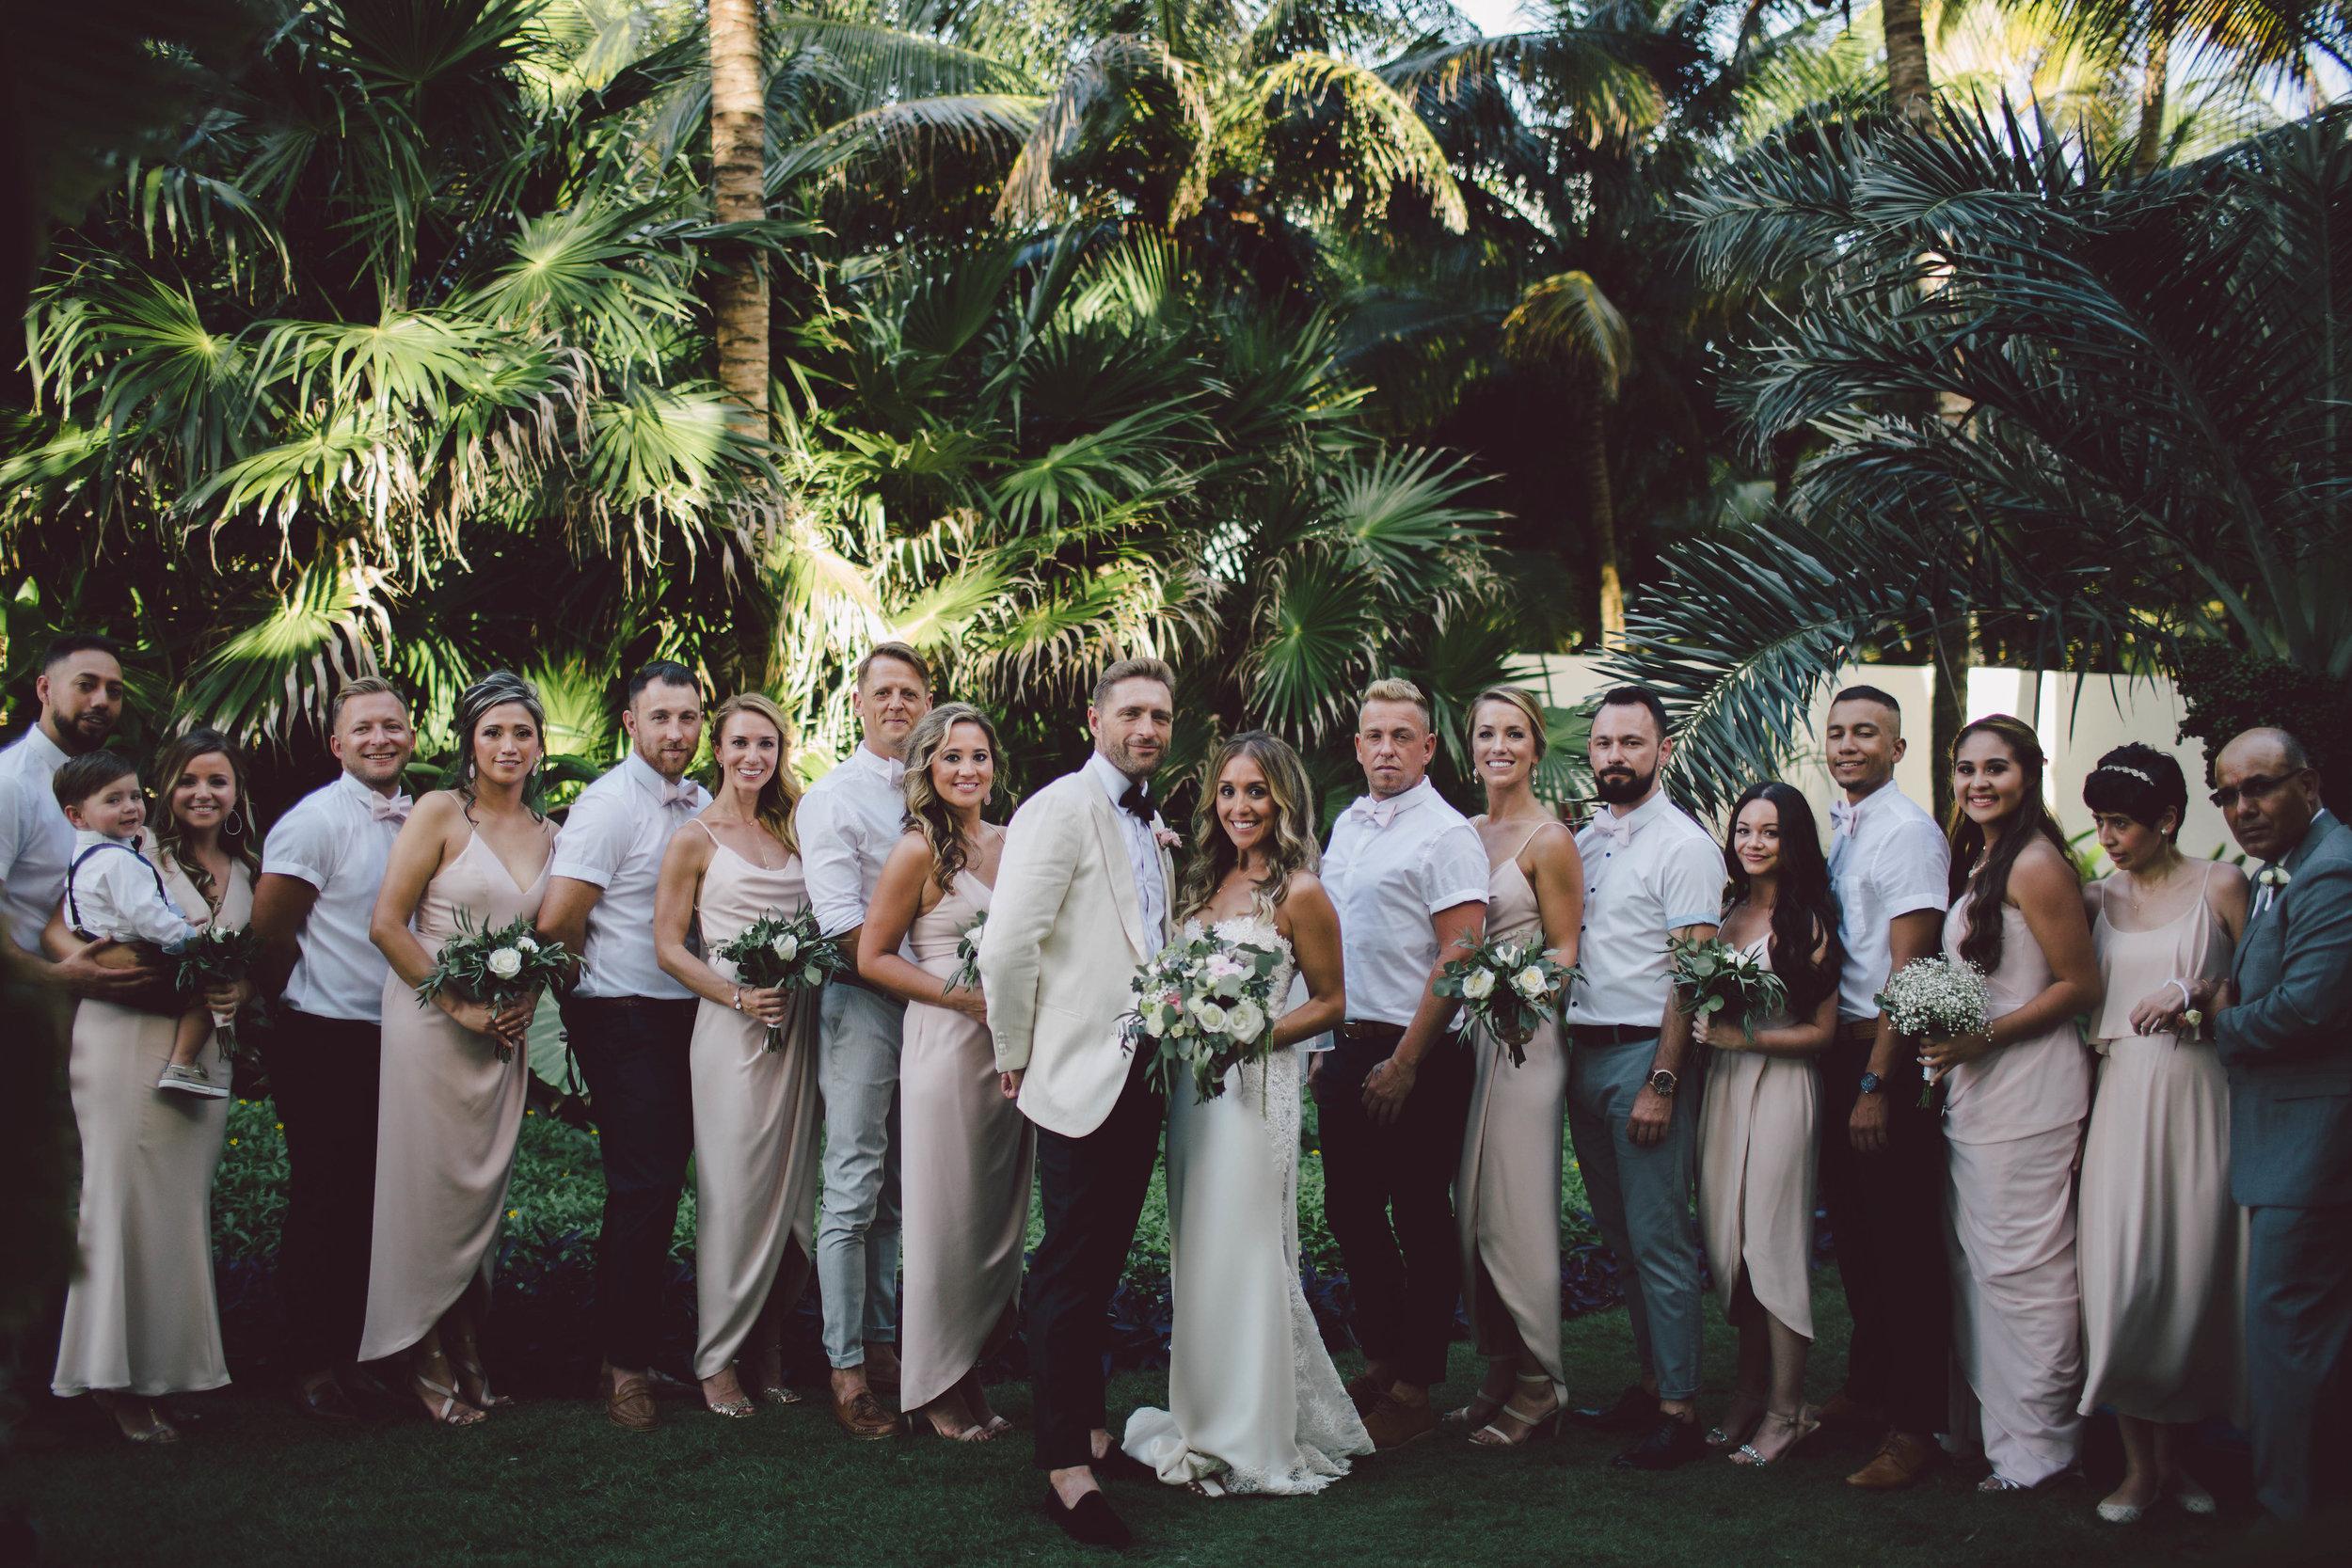 mexico_wedding_cancun_villa_la_joya_evangeline_lane_078.jpg